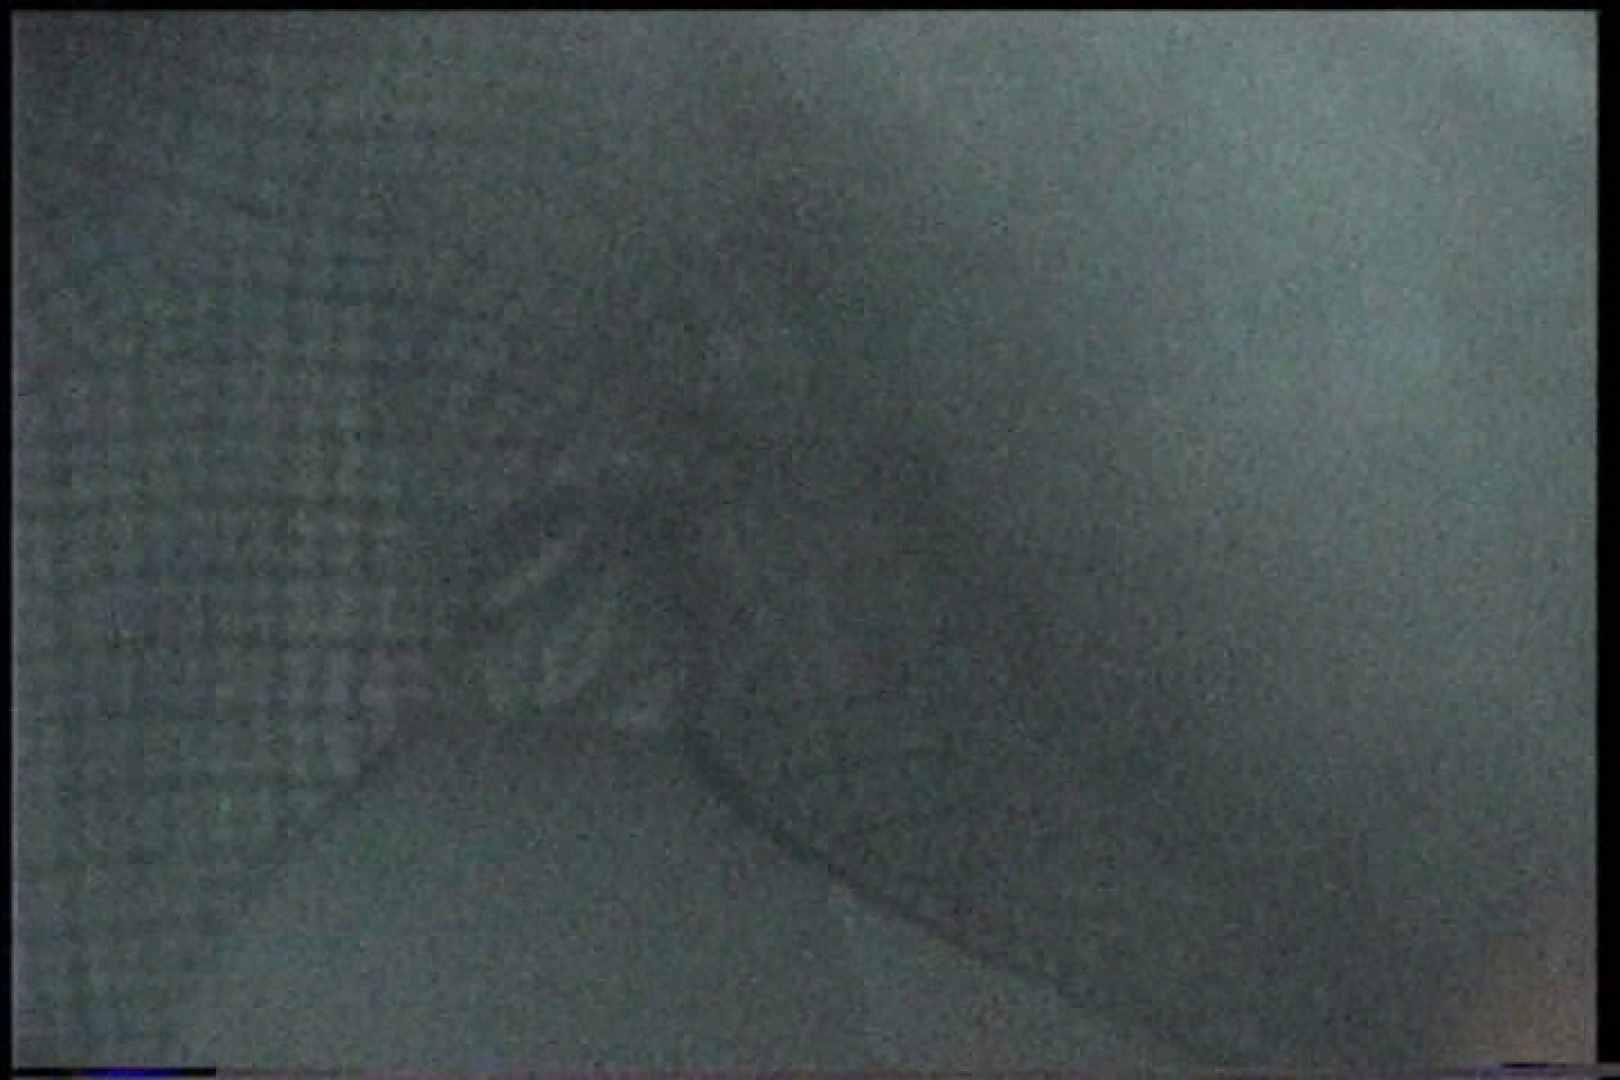 充血監督の深夜の運動会Vol.189 美乳 エロ無料画像 101画像 46